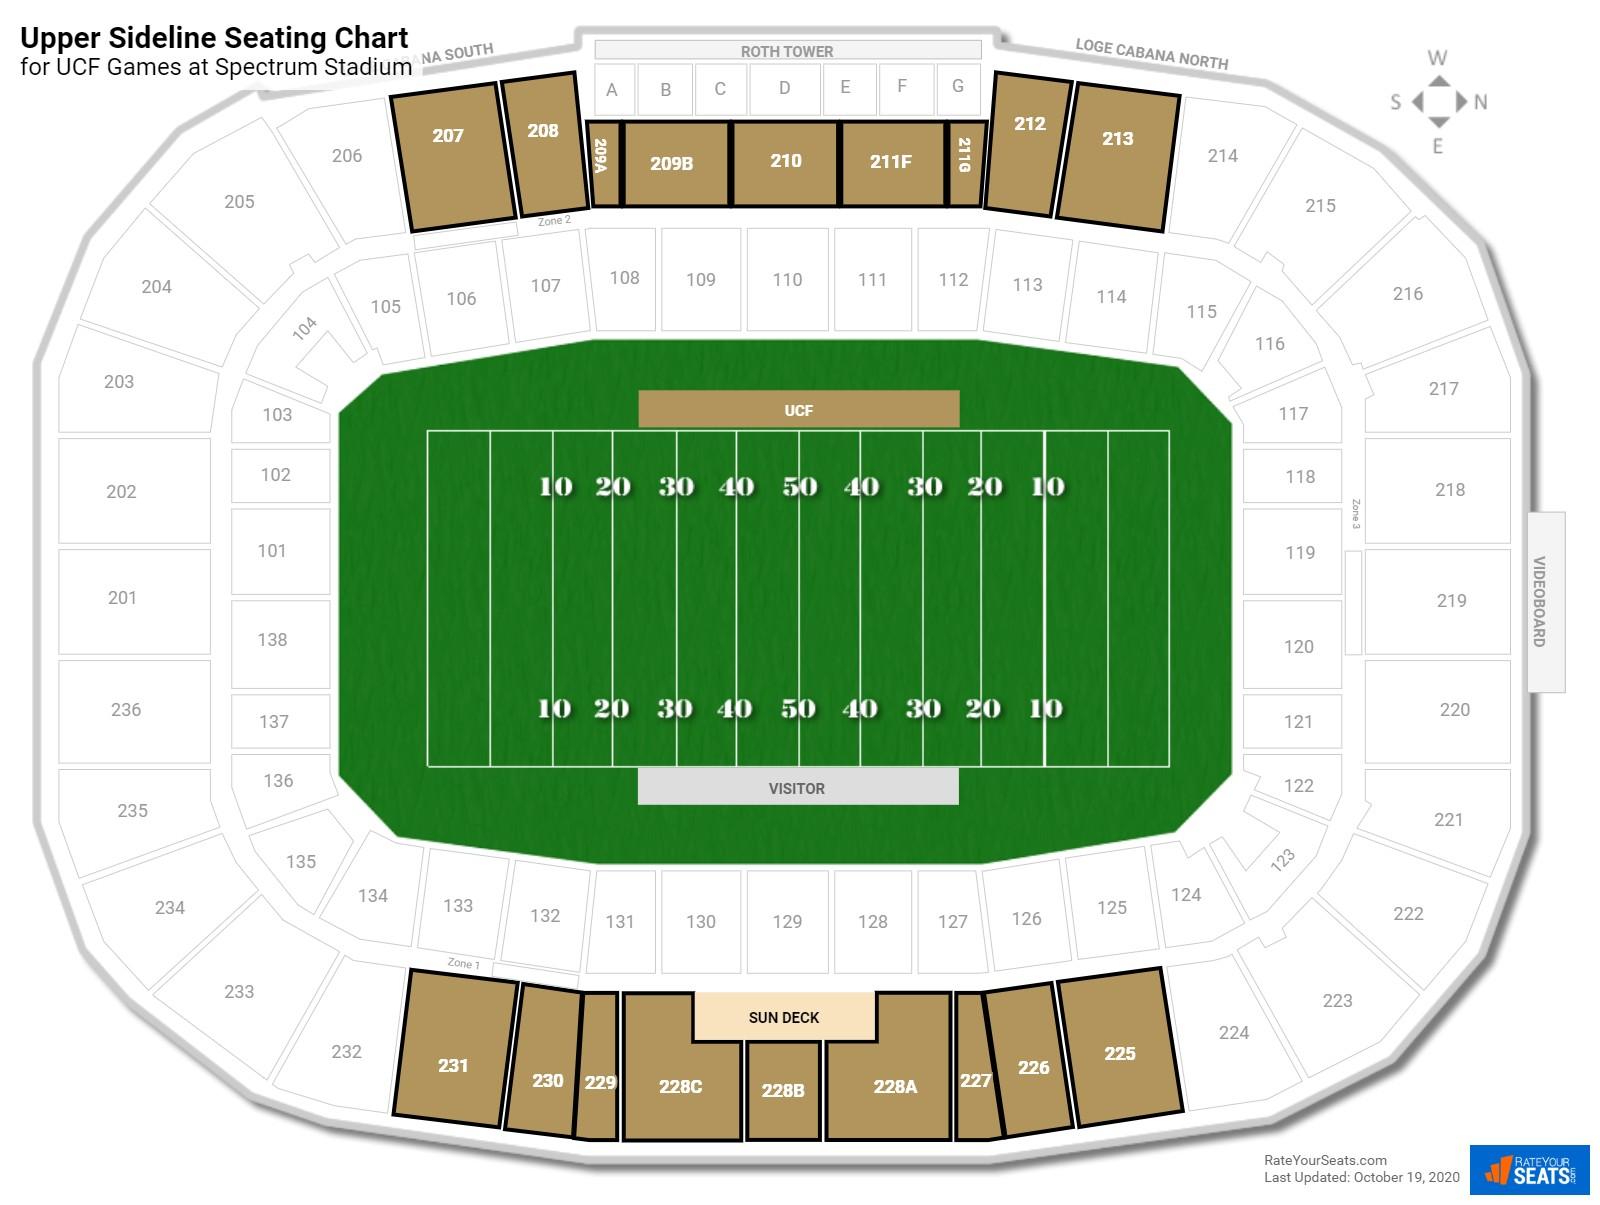 Spectrum Stadium Upper Sideline Seating Chart